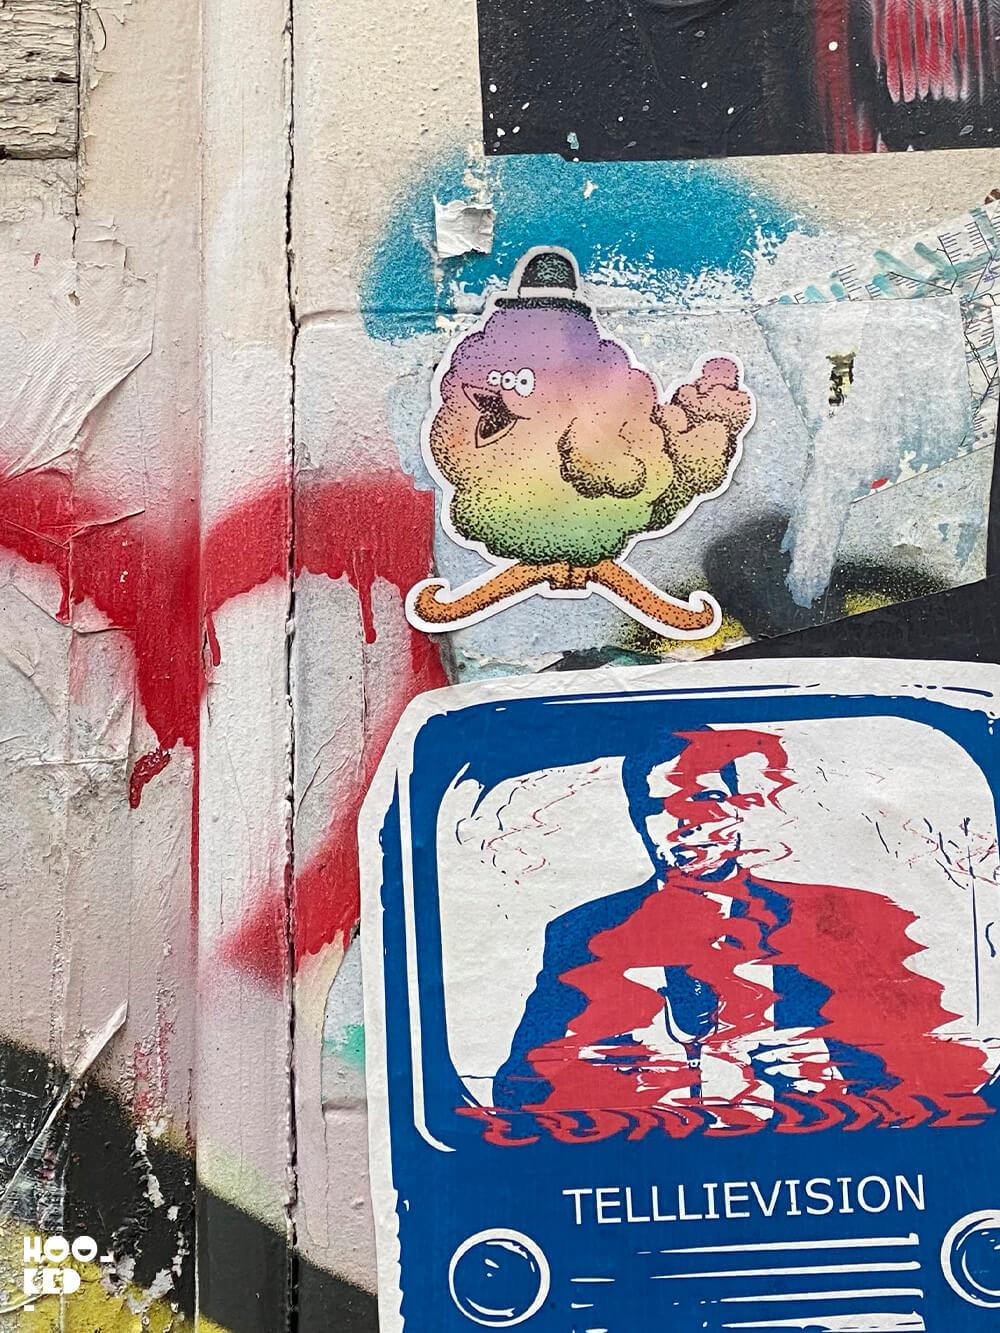 London street art stickers by artist Craig Robertson aka Purshone.